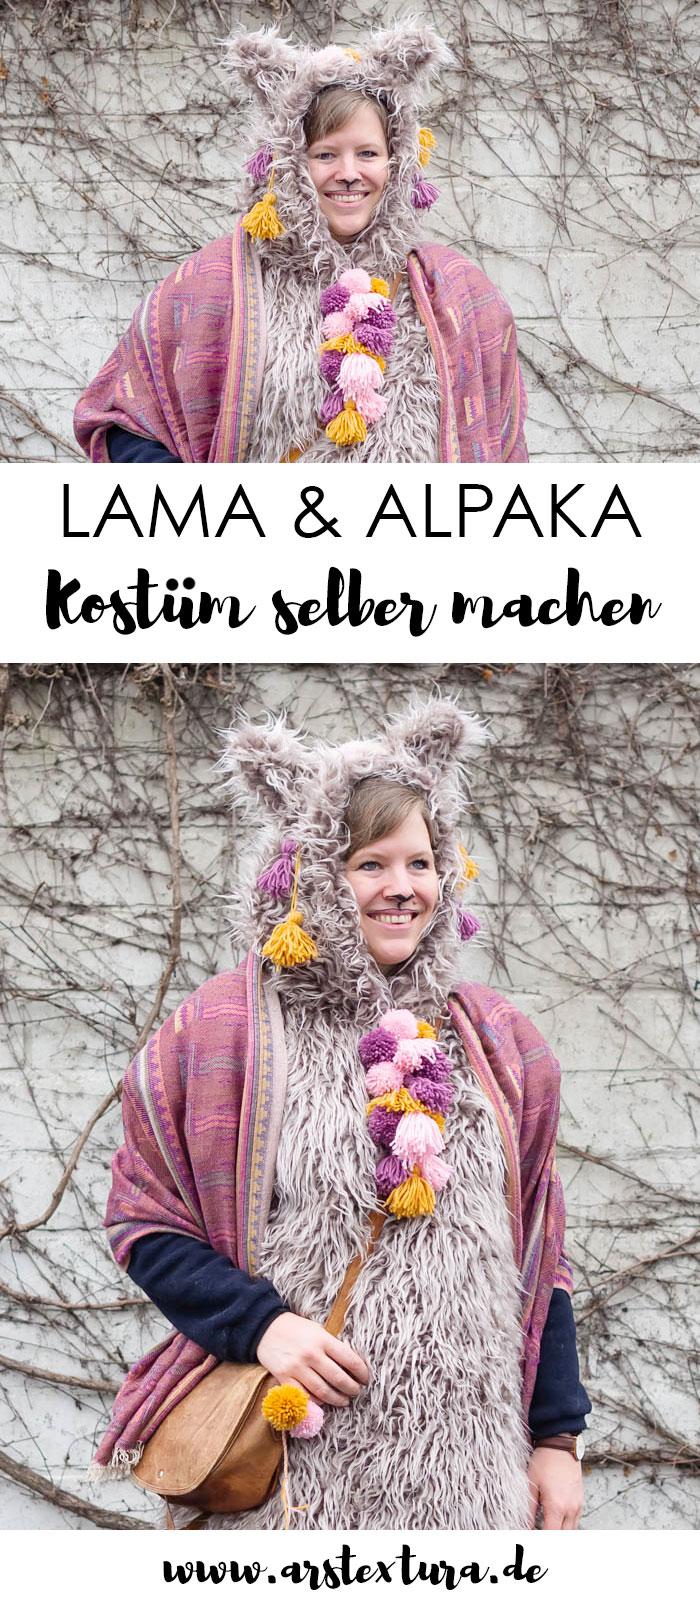 Lama & Alpaka Kostüm zu Karneval - das perfekte warme Outdoor Kostüm #karneval #lama #alpaka